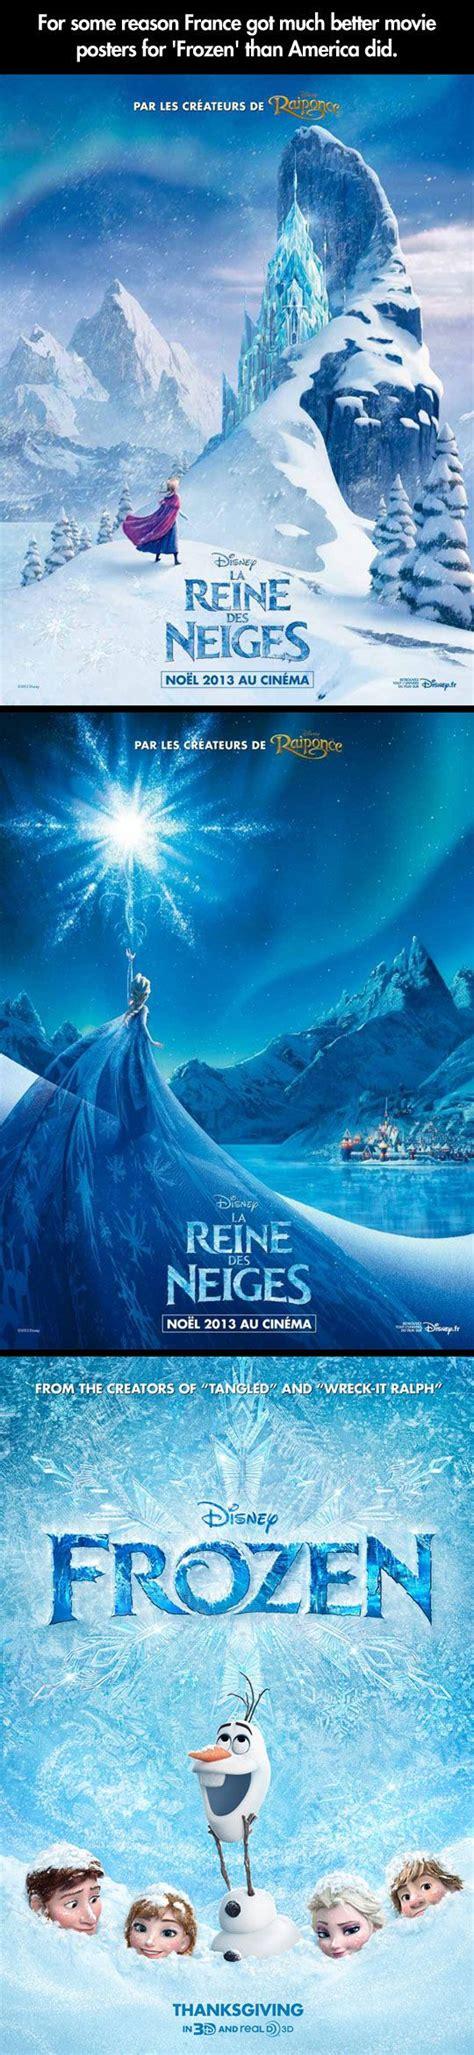 frozen french poster elsa and anna photo 35932156 fanpop 27 best frozen humor images on pinterest ha ha disney